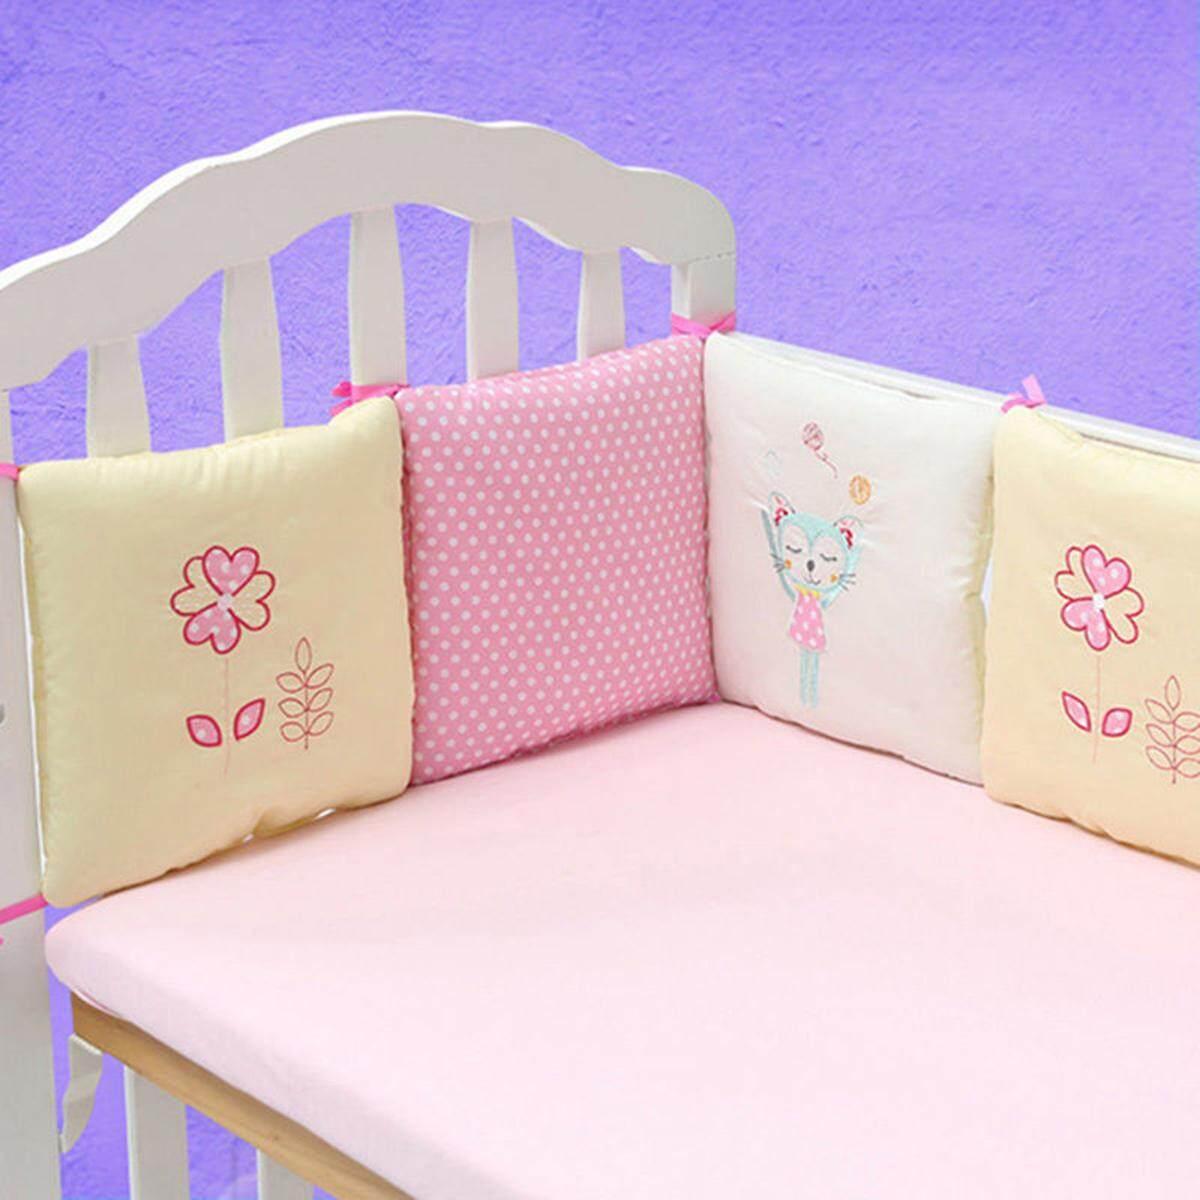 6Pcs Popular Crib Bumper Protective Baby Nursery Bedding Comfy Infant Cot Pad